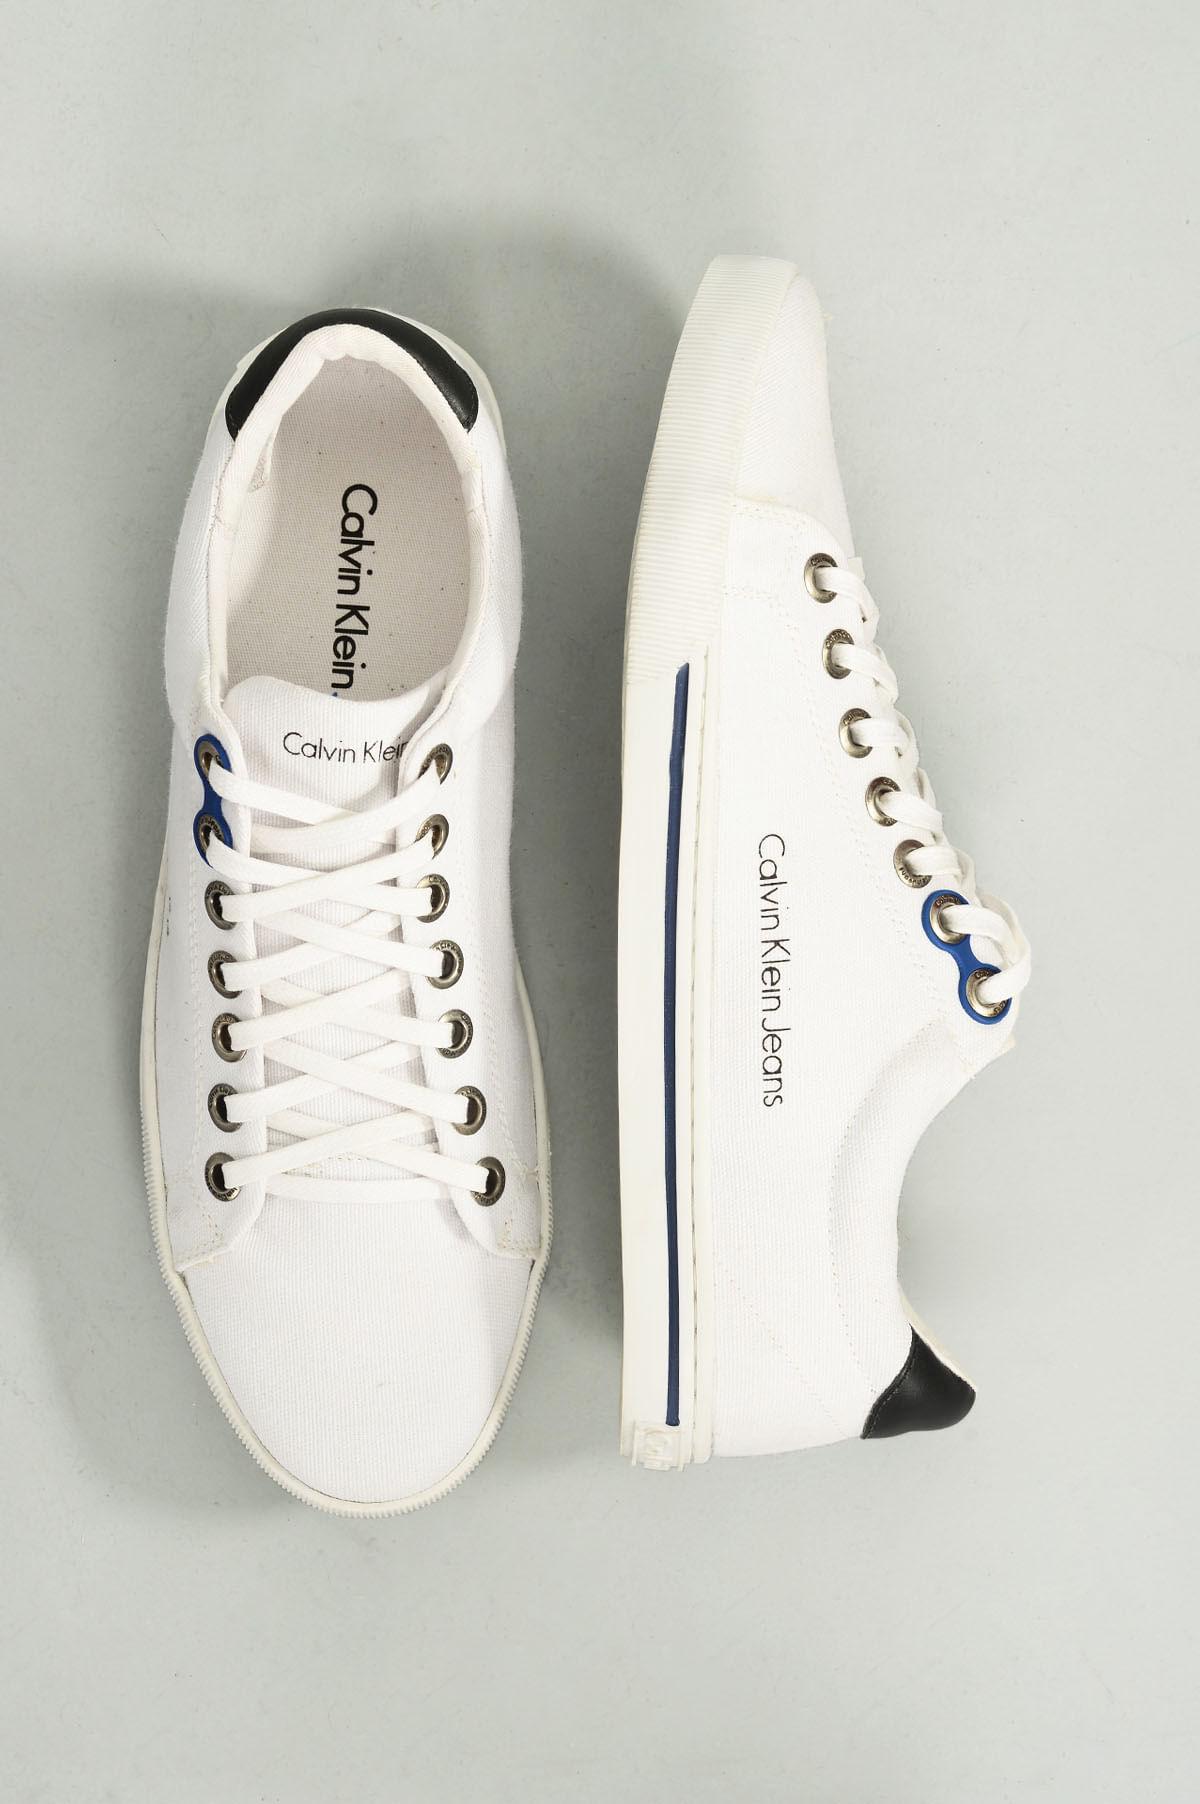 54db4644ad9 Sapatênis Masculino Calvin Klein Enzo TEC - BRANCO - Mundial Calçados